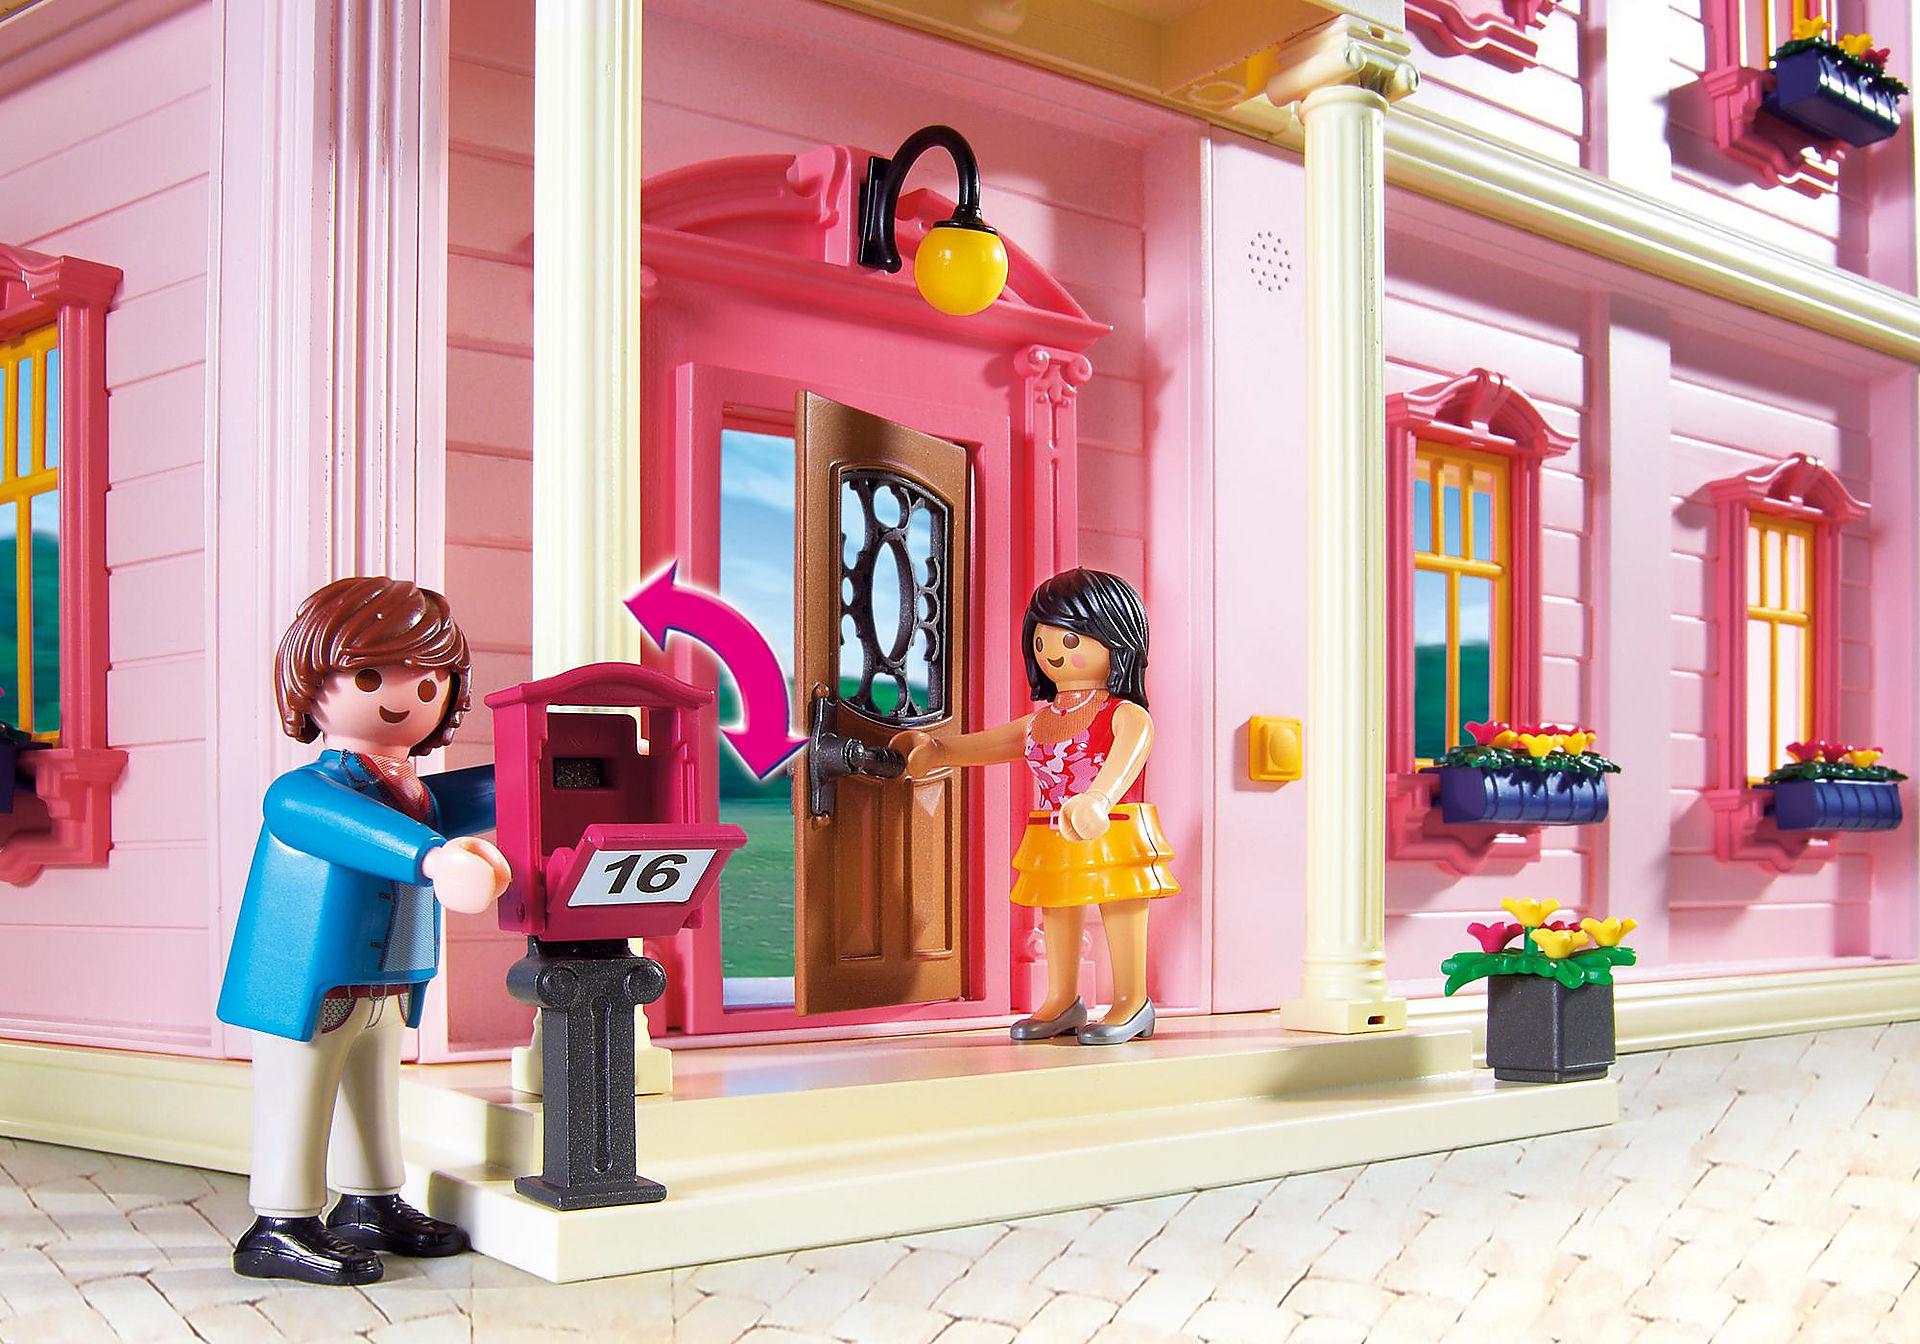 http://media.playmobil.com/i/playmobil/5303_product_extra1/Deluxe Dollhouse